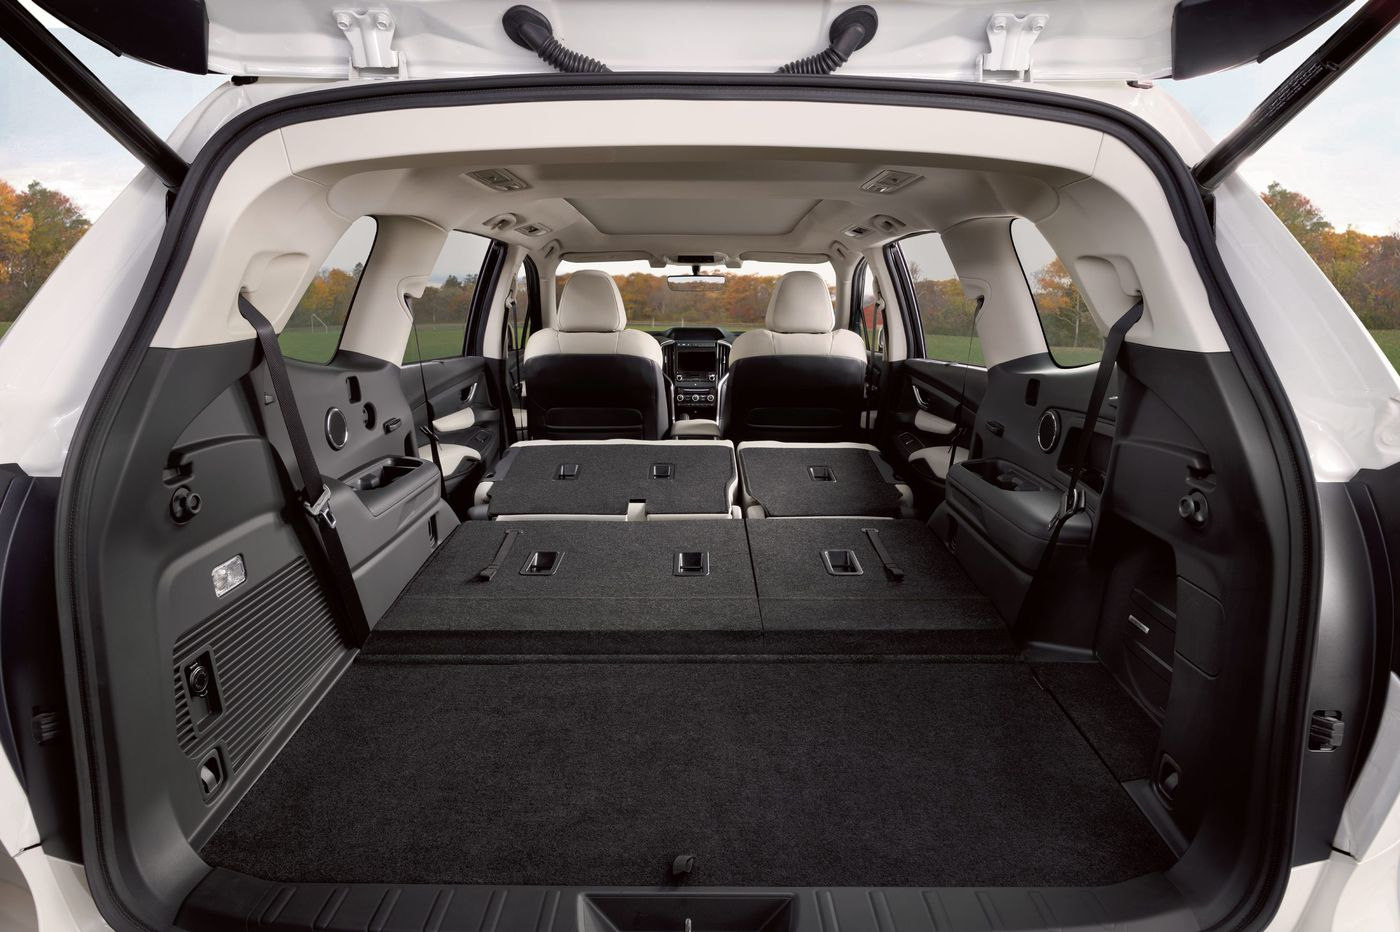 Roomy three-row SUVs appeal to 'child-raising generation'